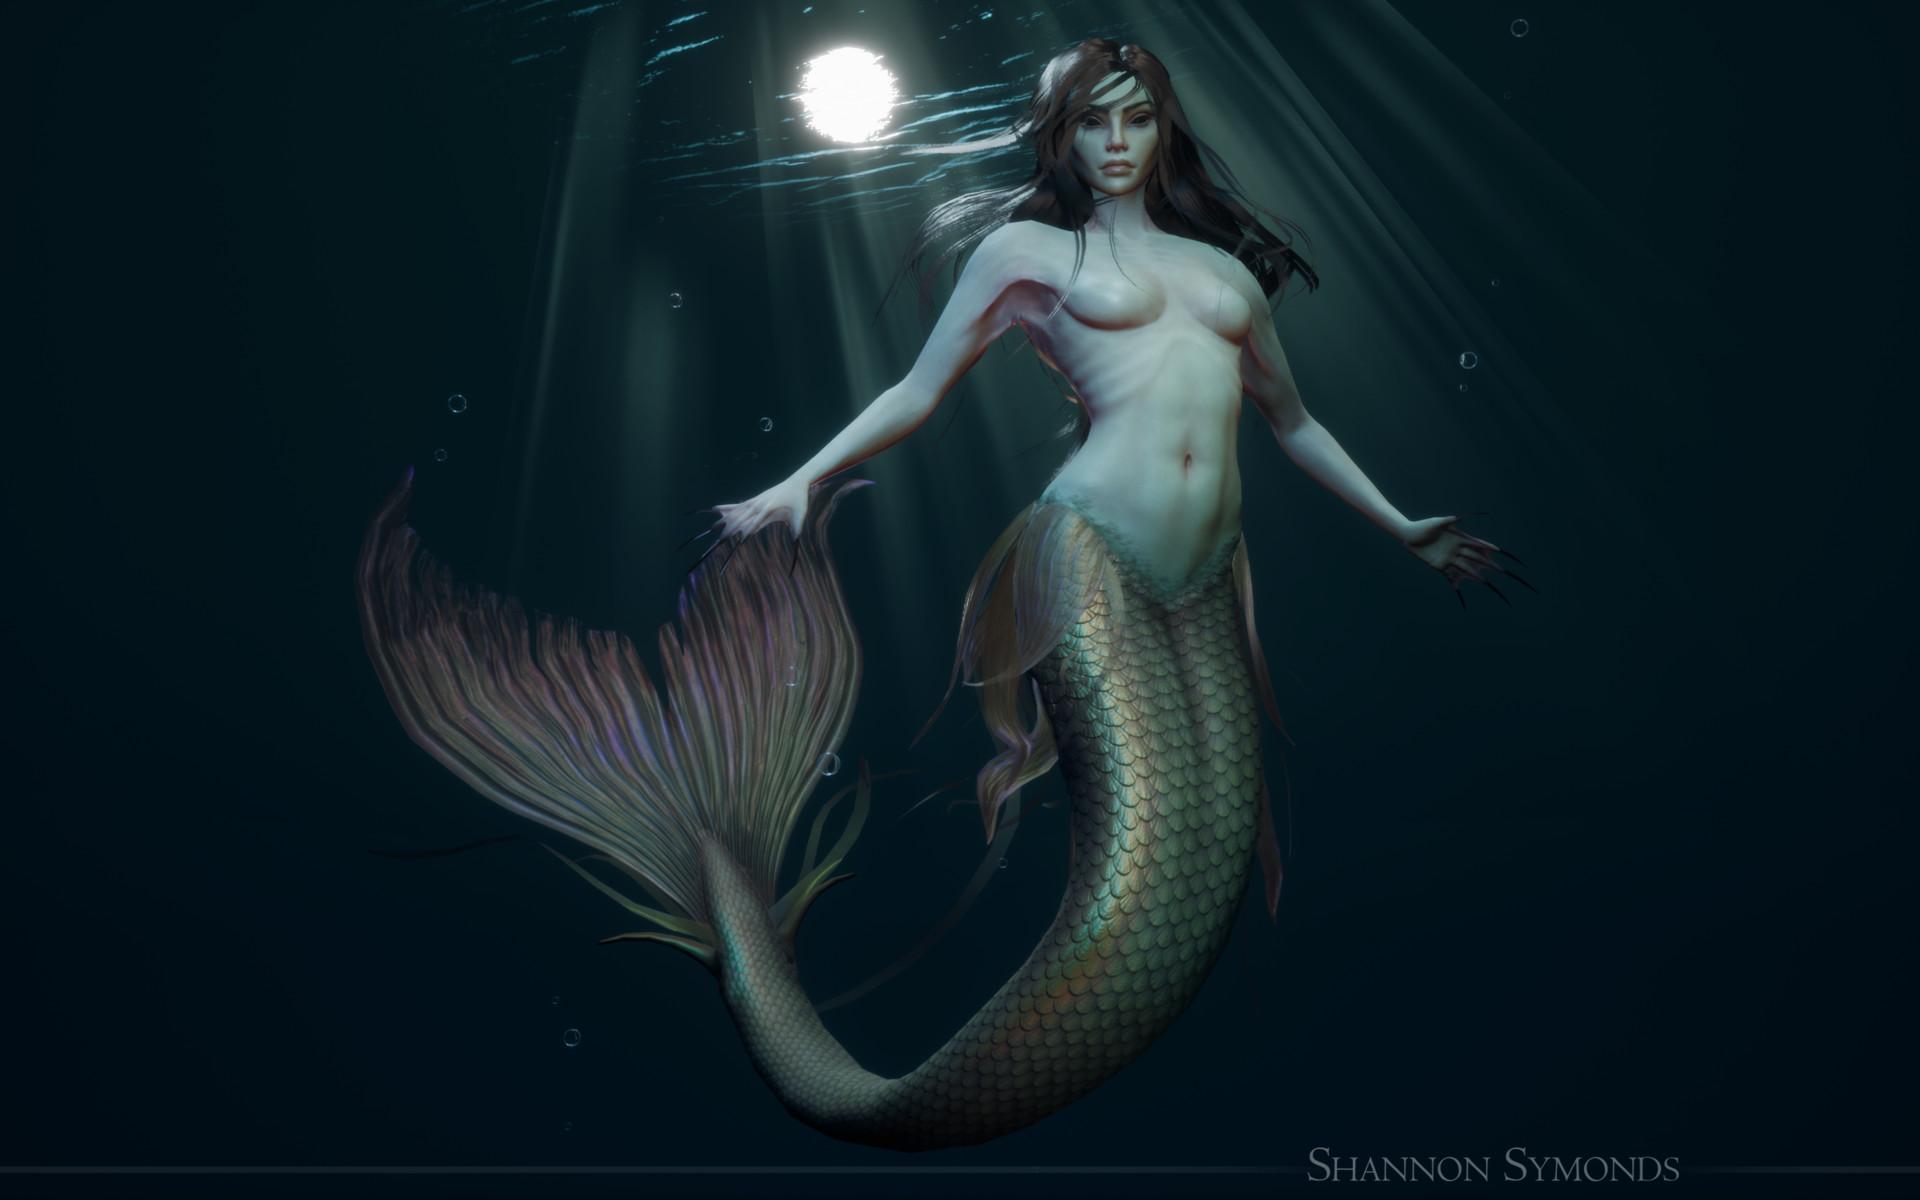 Shannon symonds main render mermaid